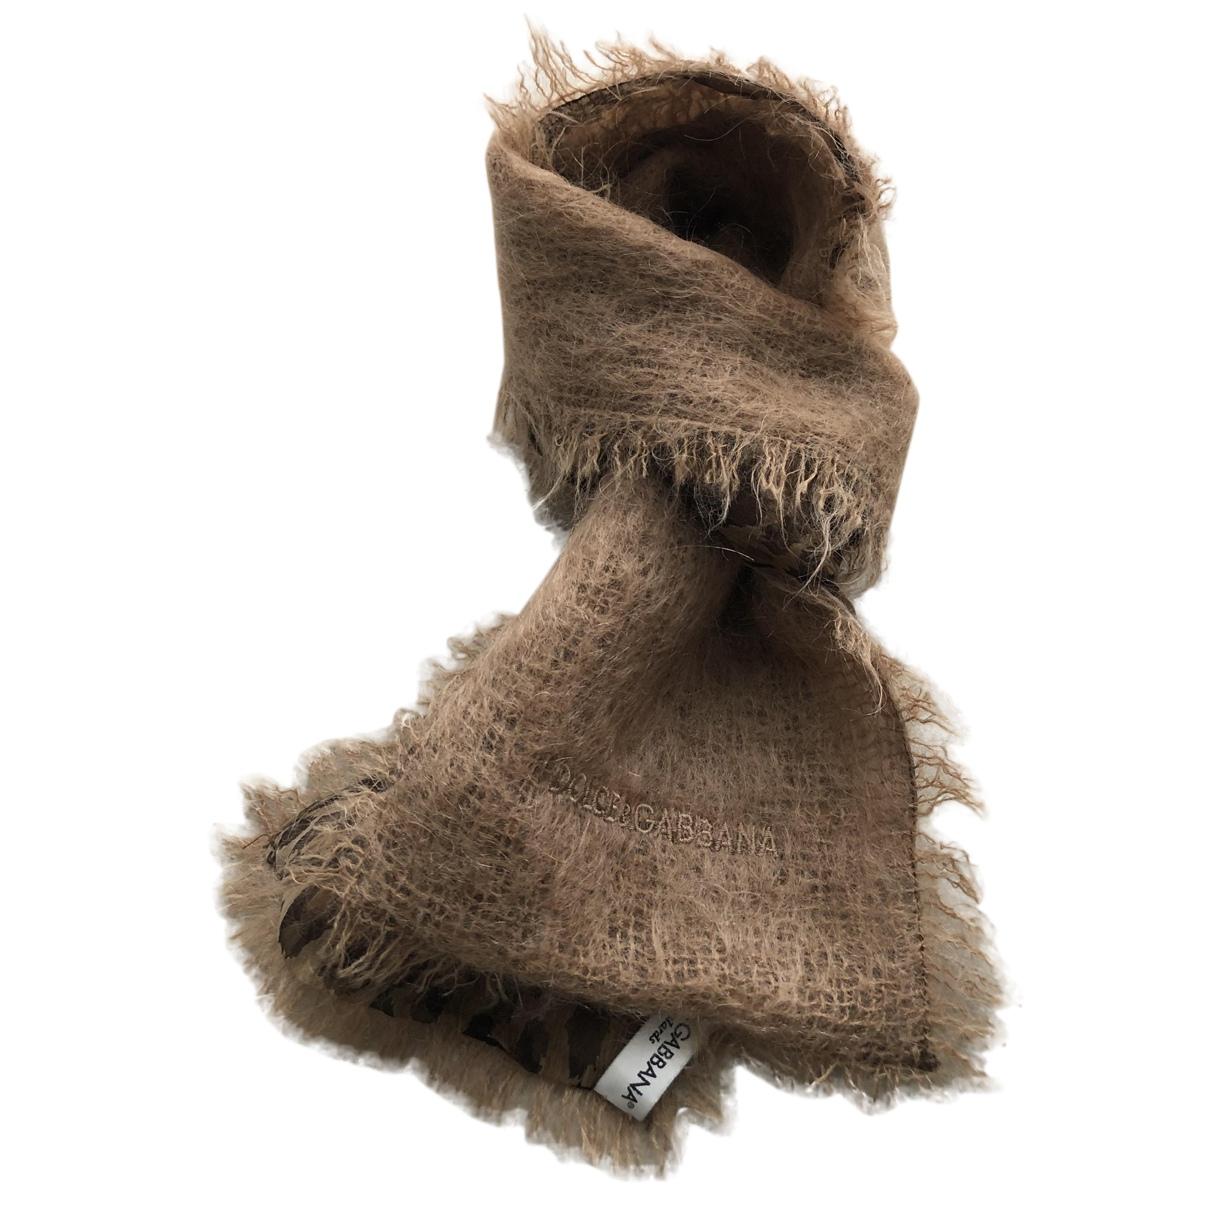 Dolce & Gabbana N Camel Wool scarf for Women N